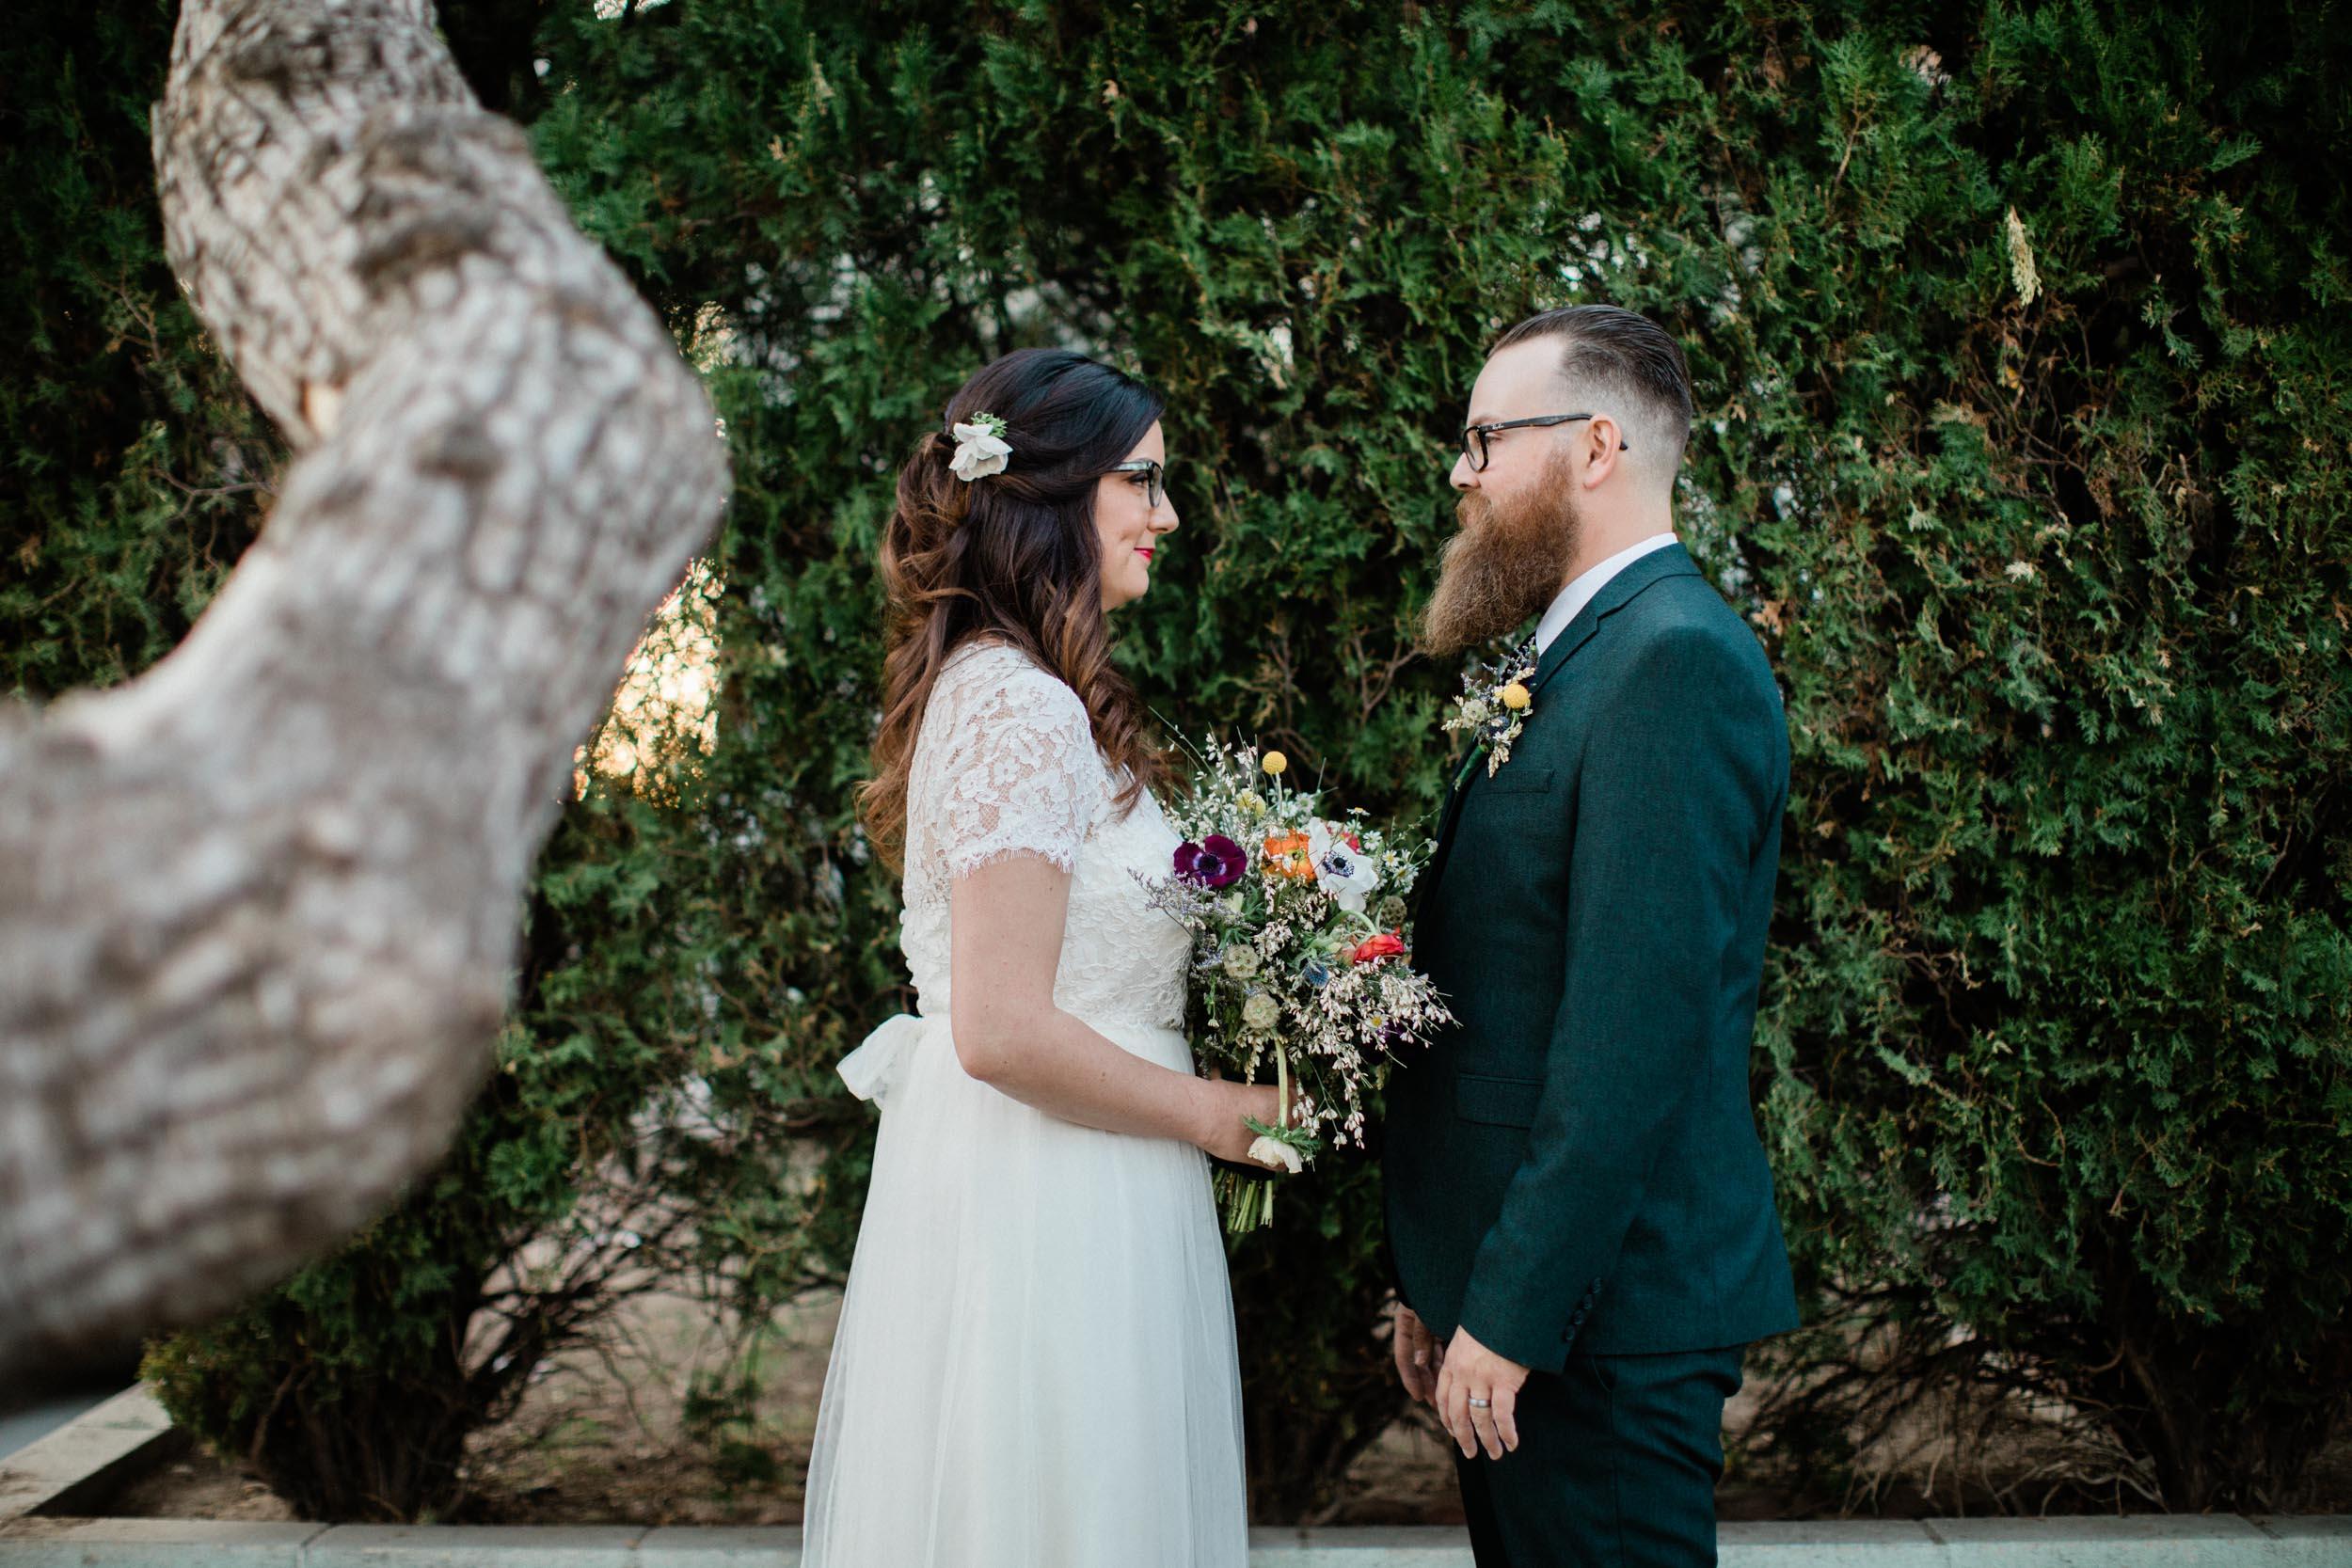 BKM-Photography-Highland-Park-Los-Angeles-Backyard-DIY-Wedding-0103.jpg